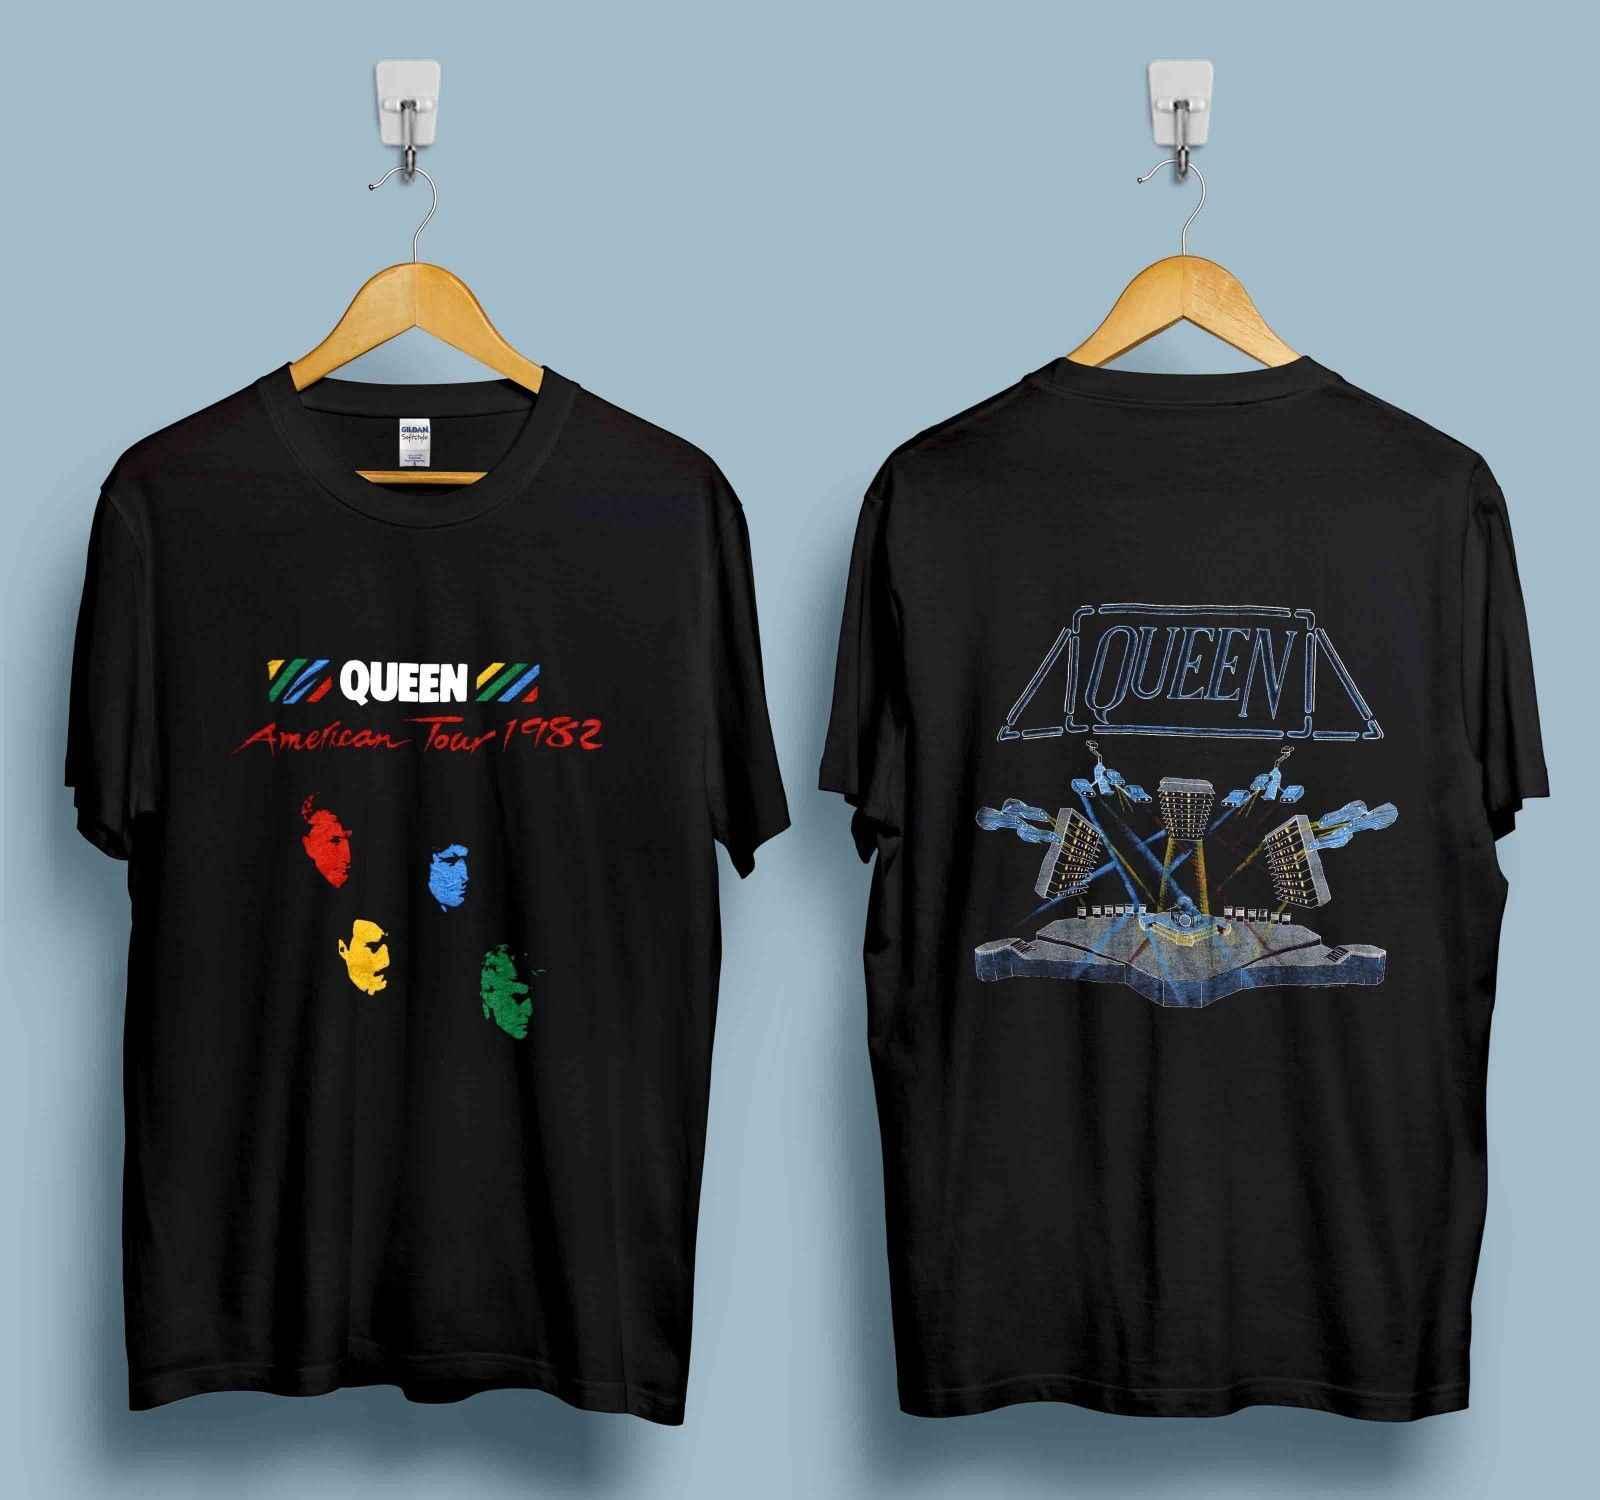 VINTAGE QUEEN TSHIRT 1982 HOT SPACE TOUR GLAM ROCK BAND FREDDIE MERCURY  REPRINT Hot 2018 Summer Men\u0027S T Shirt Fashion